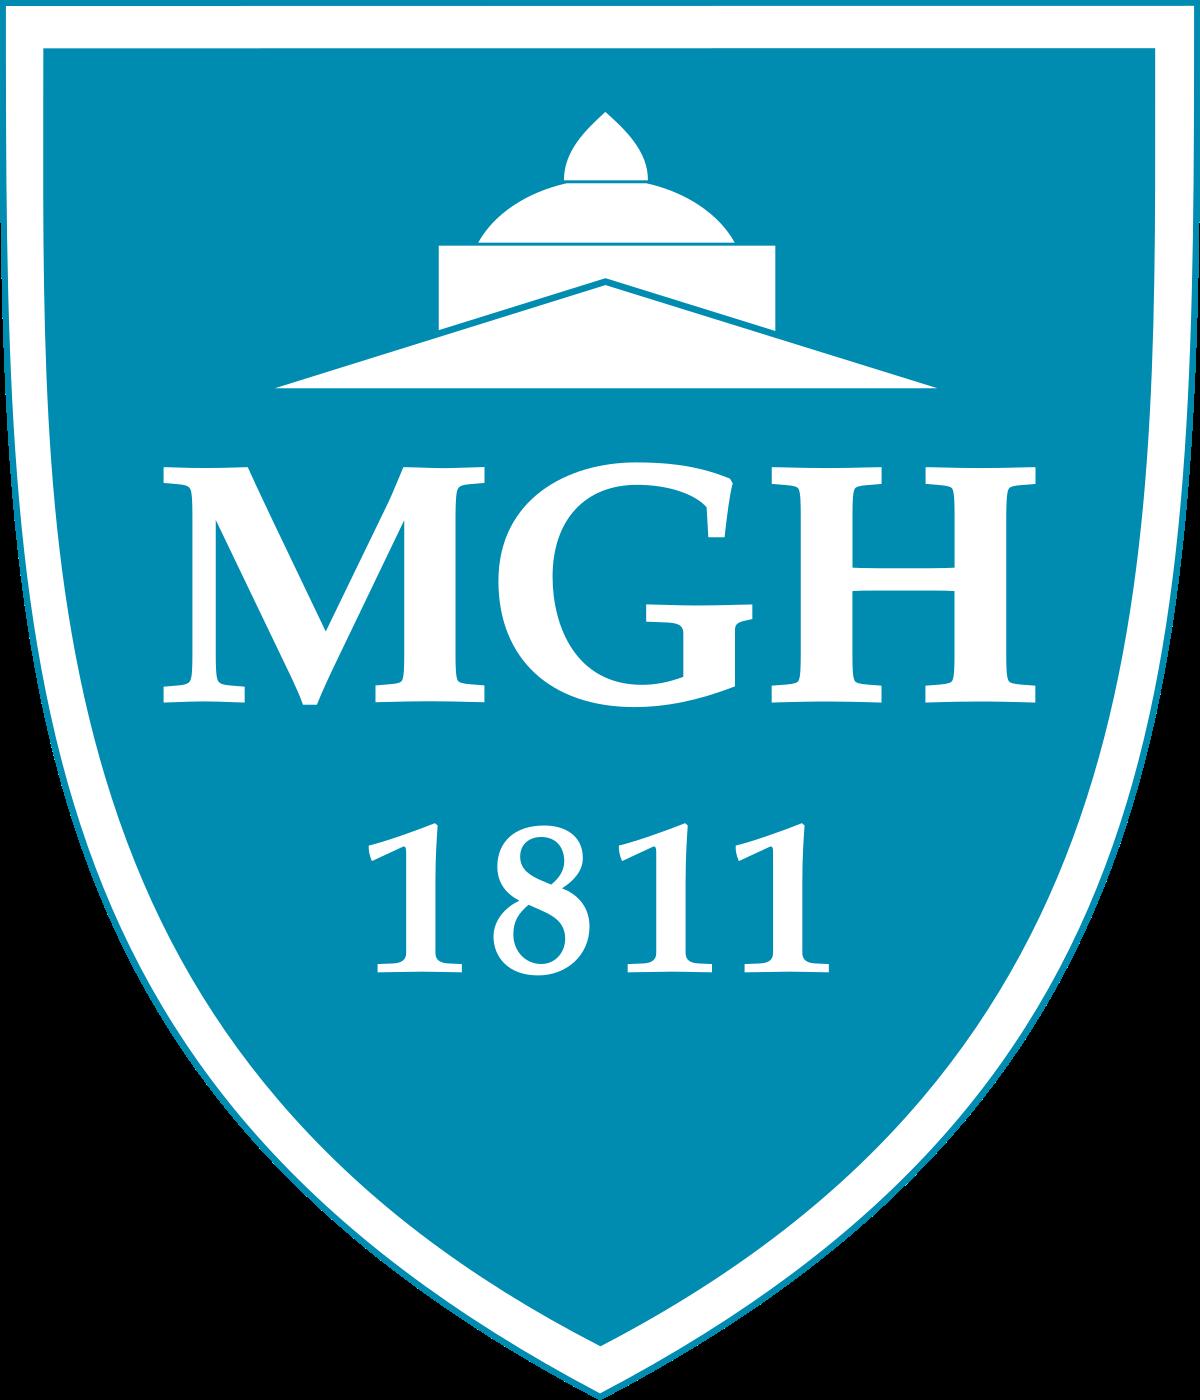 1200px-Massachusetts_General_Hospital_logo.png